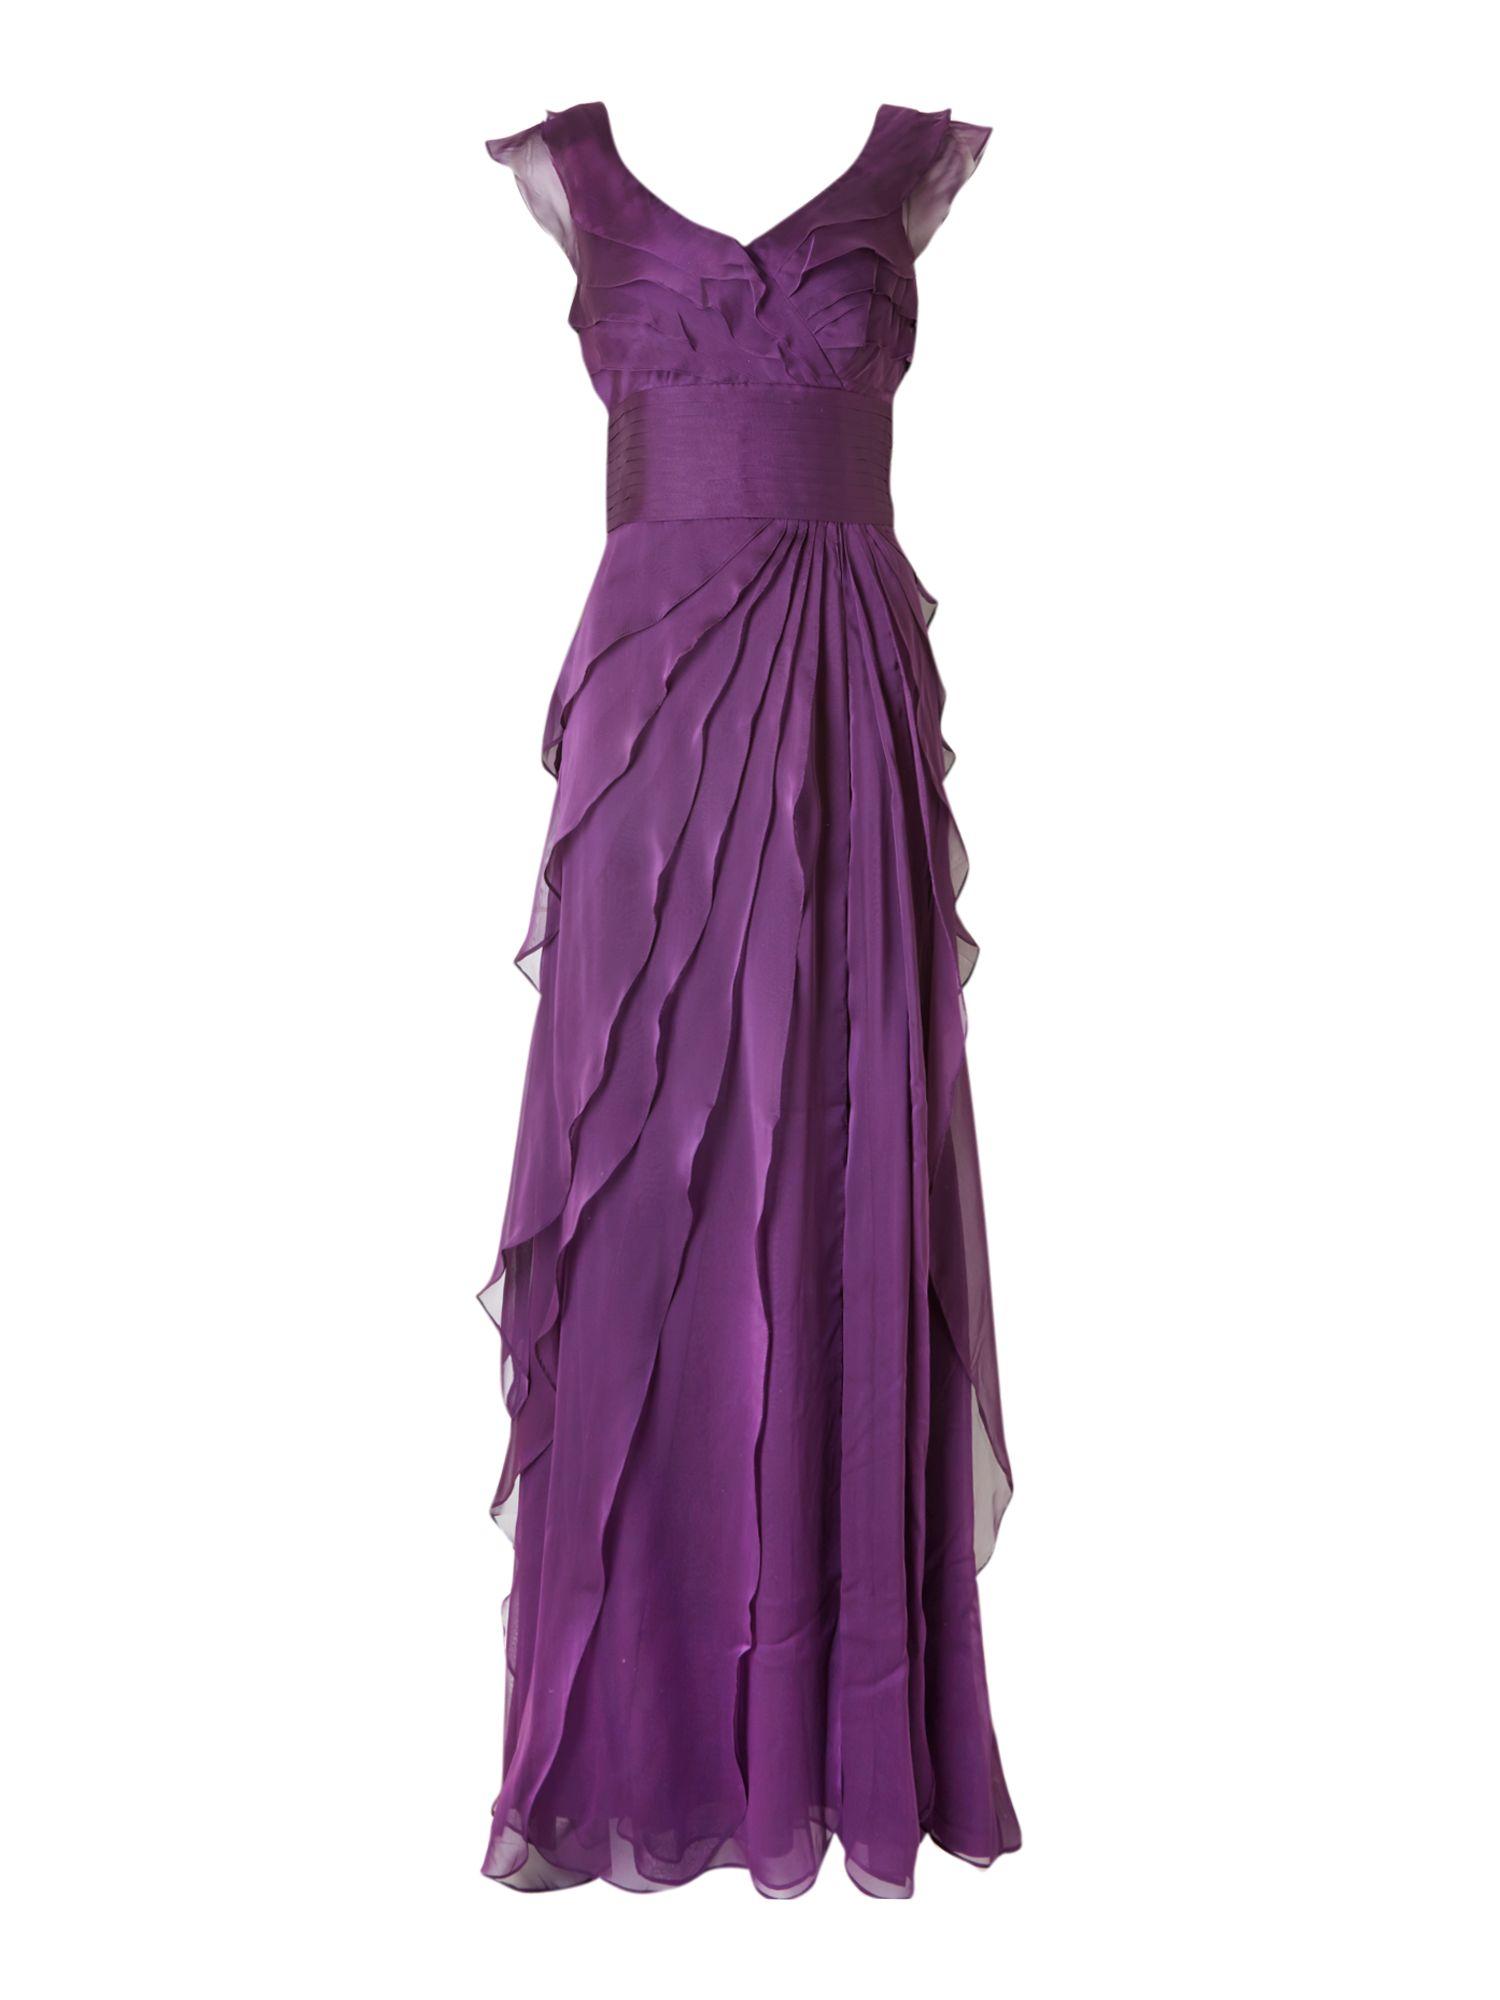 Adrianna Papell Tiered Chiffon Petal Dress